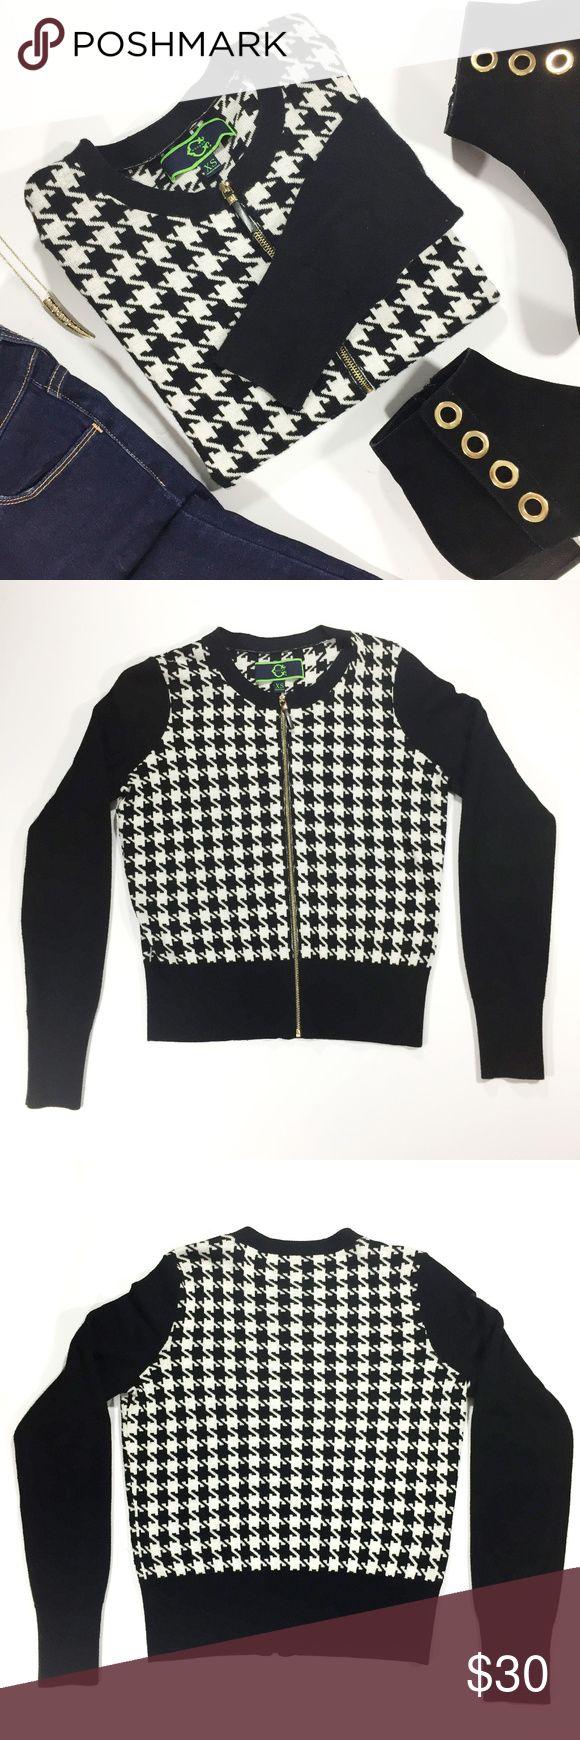 "C. Wonder Black and White Houndstooth Cardigan Long sleeve black and white houndstooth cardigan by C. Wonder. Small snag on right sleeve. Size XS.  - Bust: 38"", waist: 30"", sleeve: 25.5"", length: 21.5""  - 30% viscose, 30%, acrylic, 25% nylon, 15% wool C. Wonder Sweaters Cardigans"